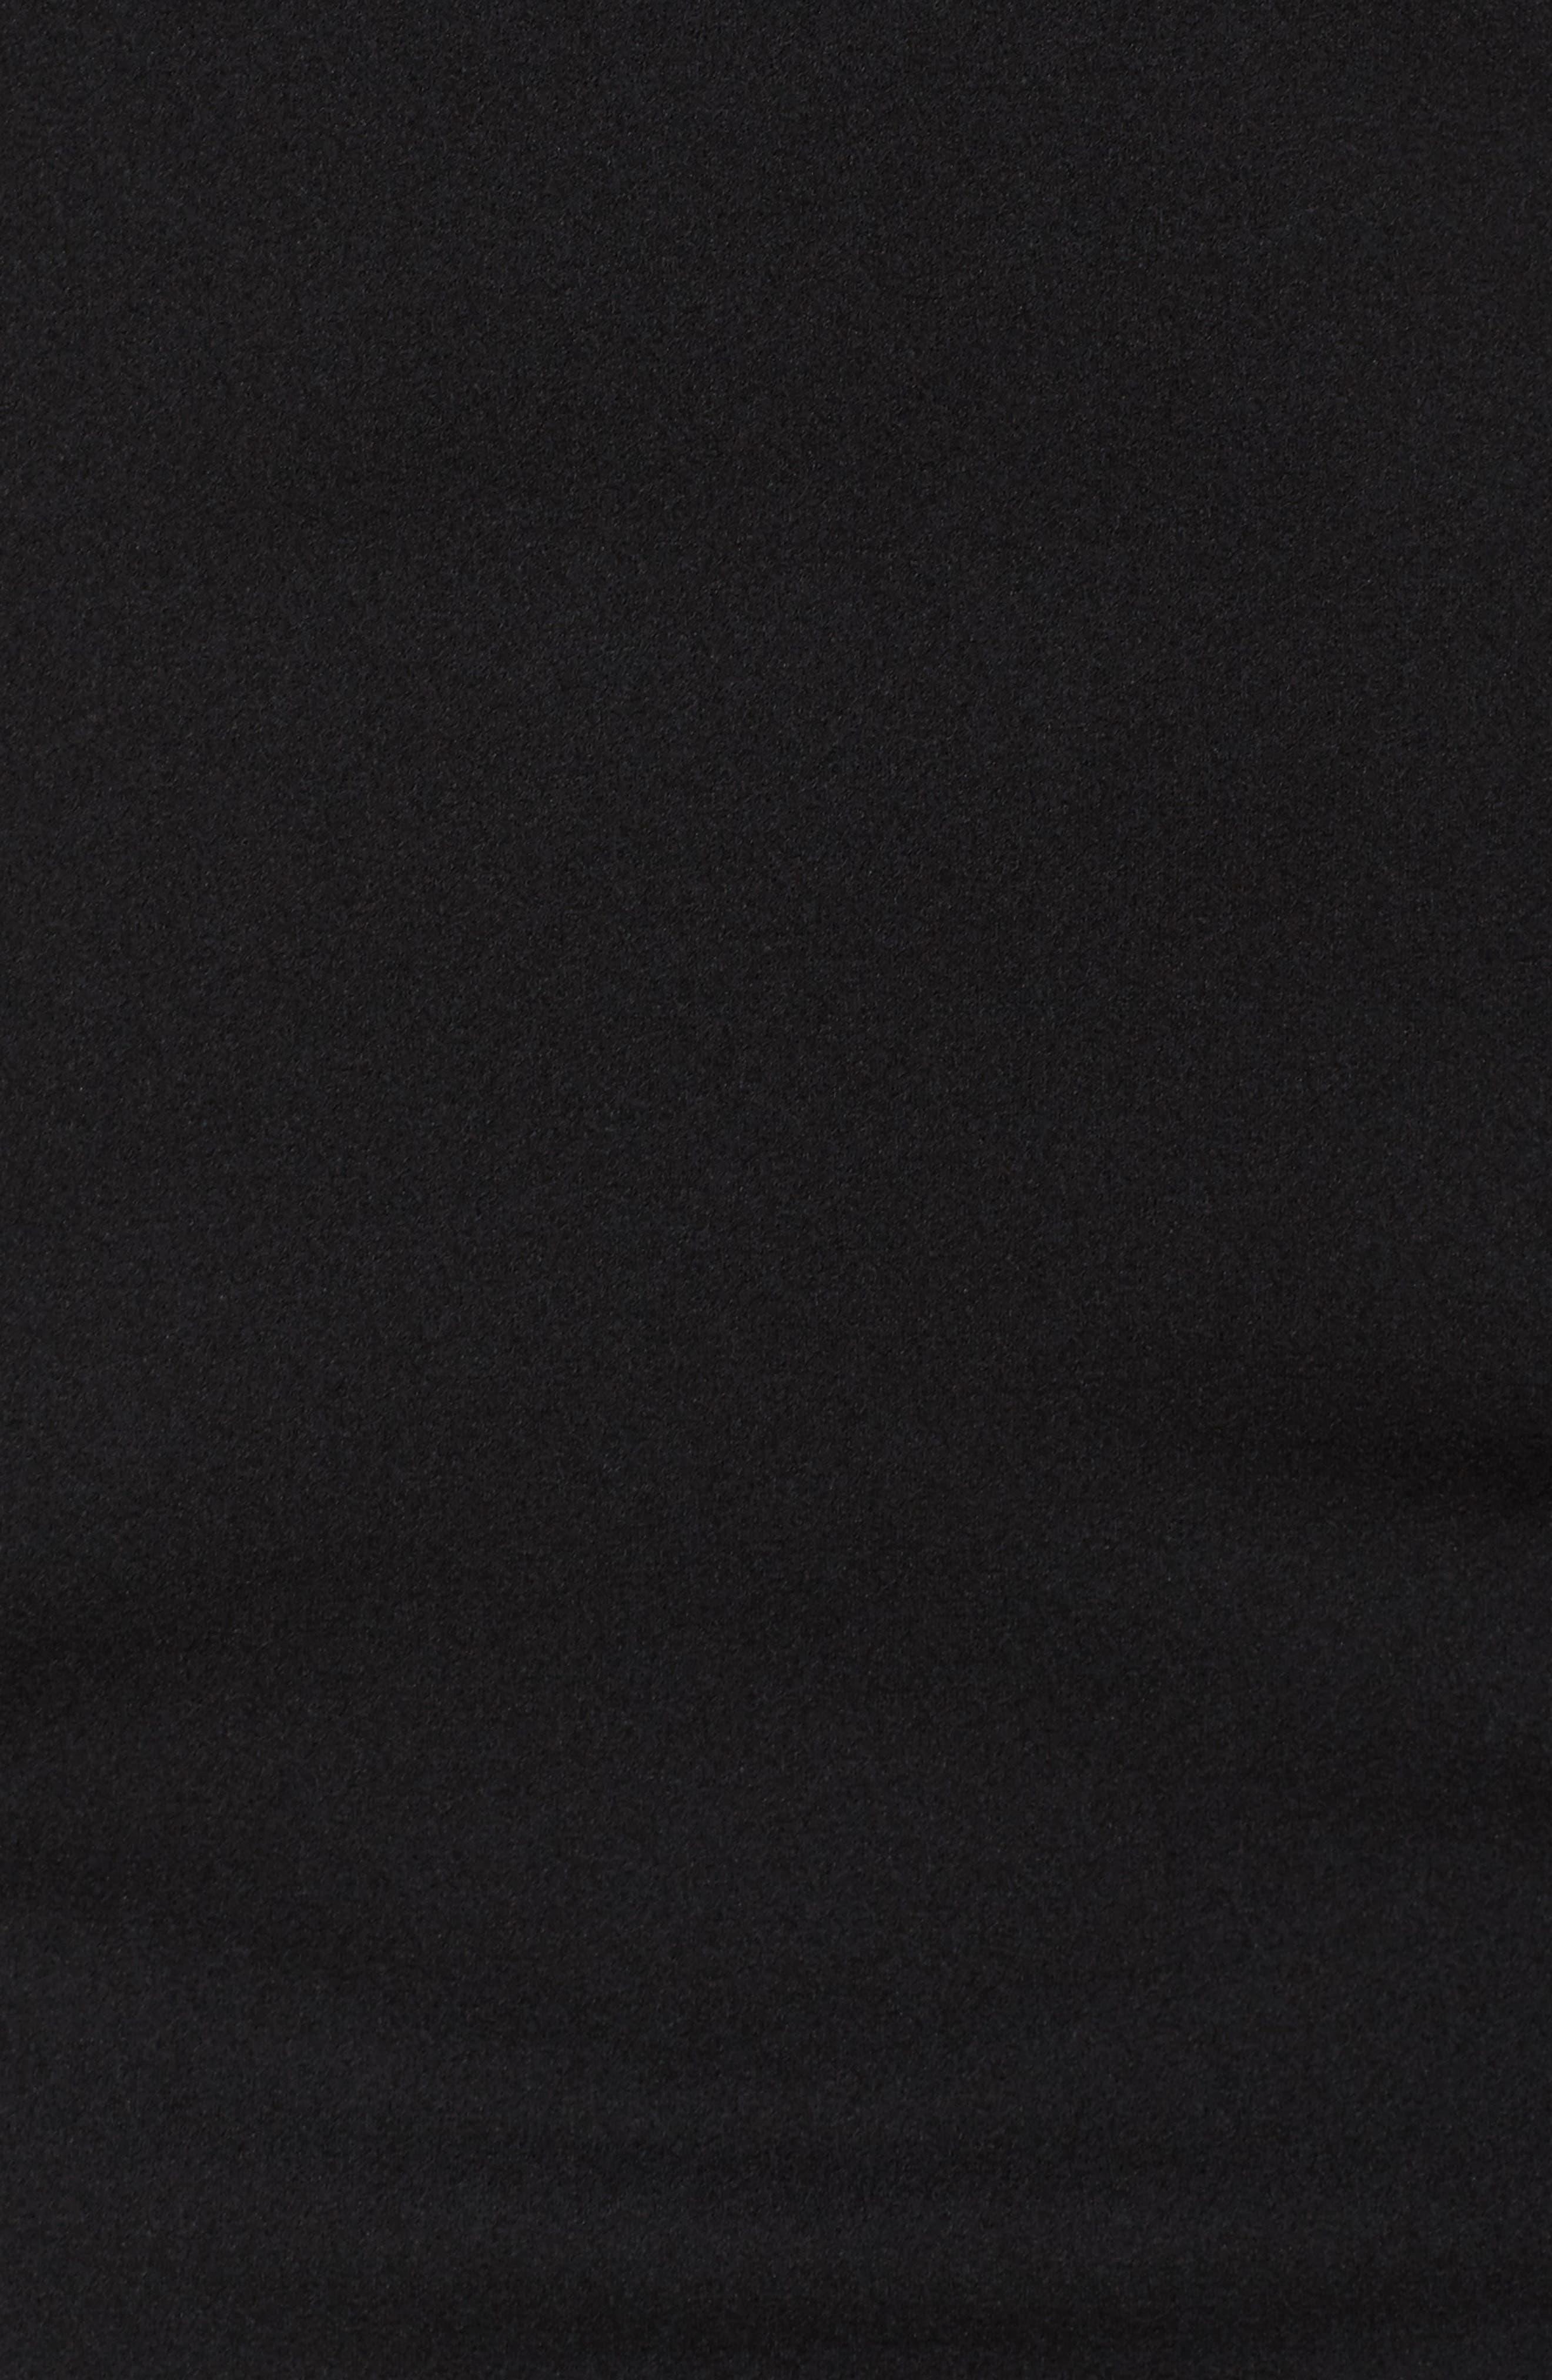 Cape Sheath Dress,                             Alternate thumbnail 6, color,                             001